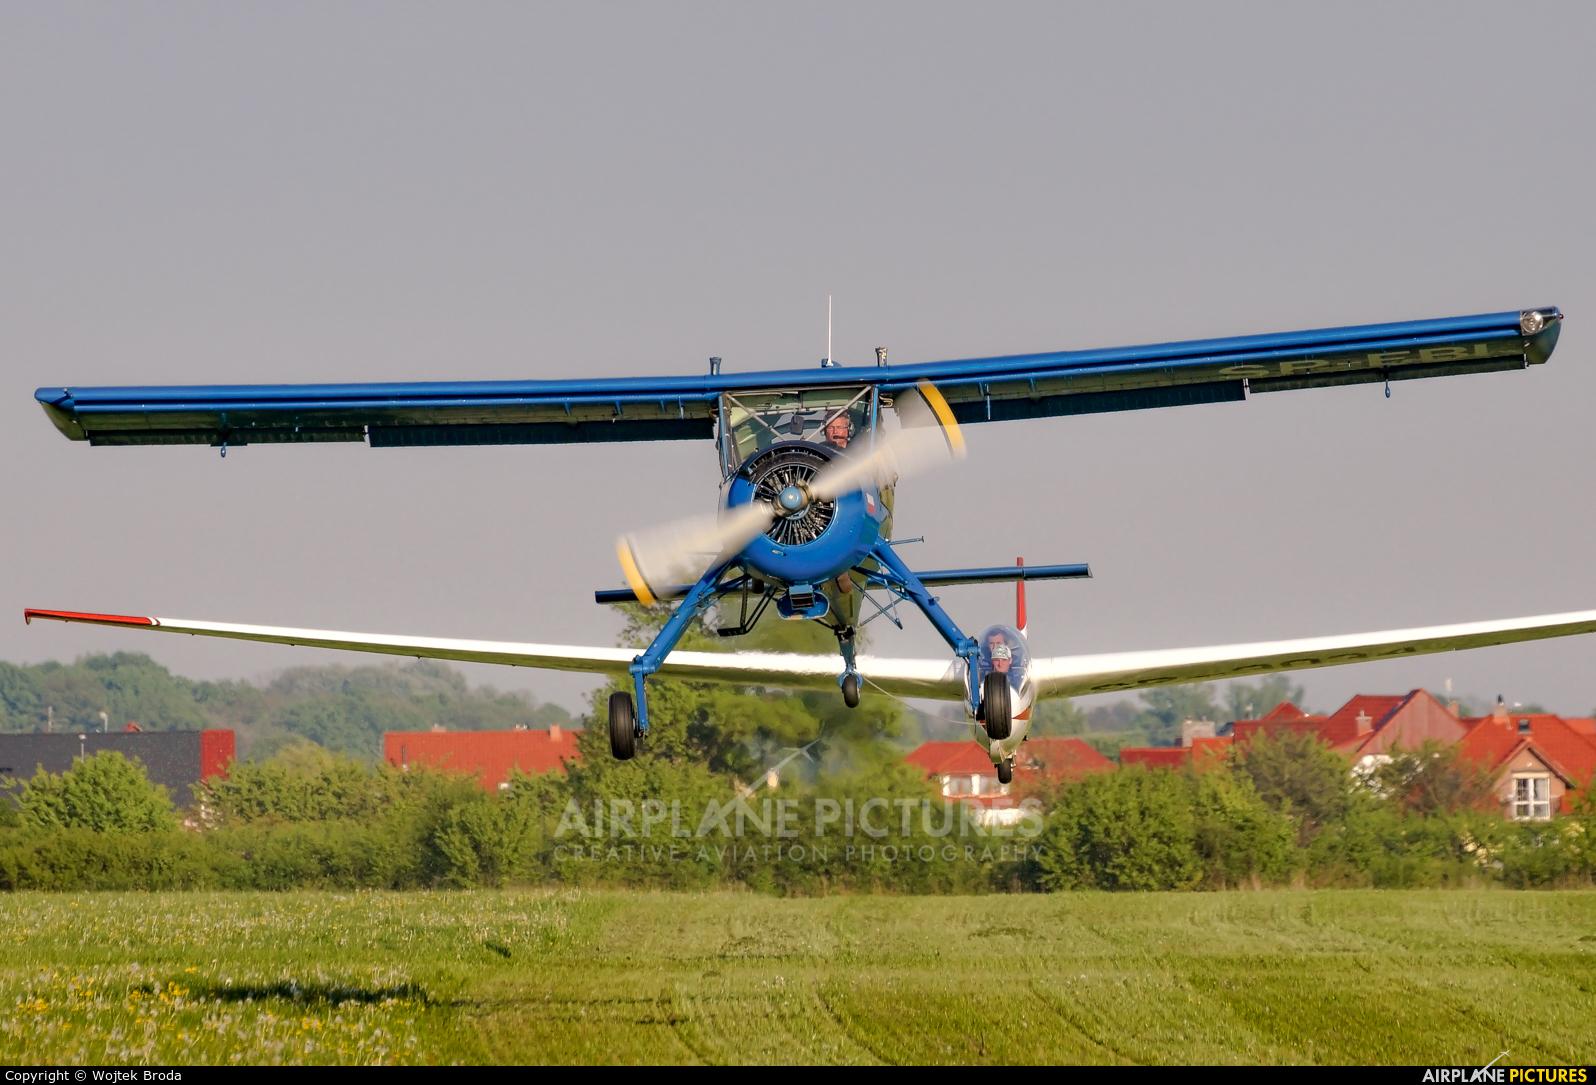 Aeroklub Wroclawski SP-EBI aircraft at Wrocław - Szymanów